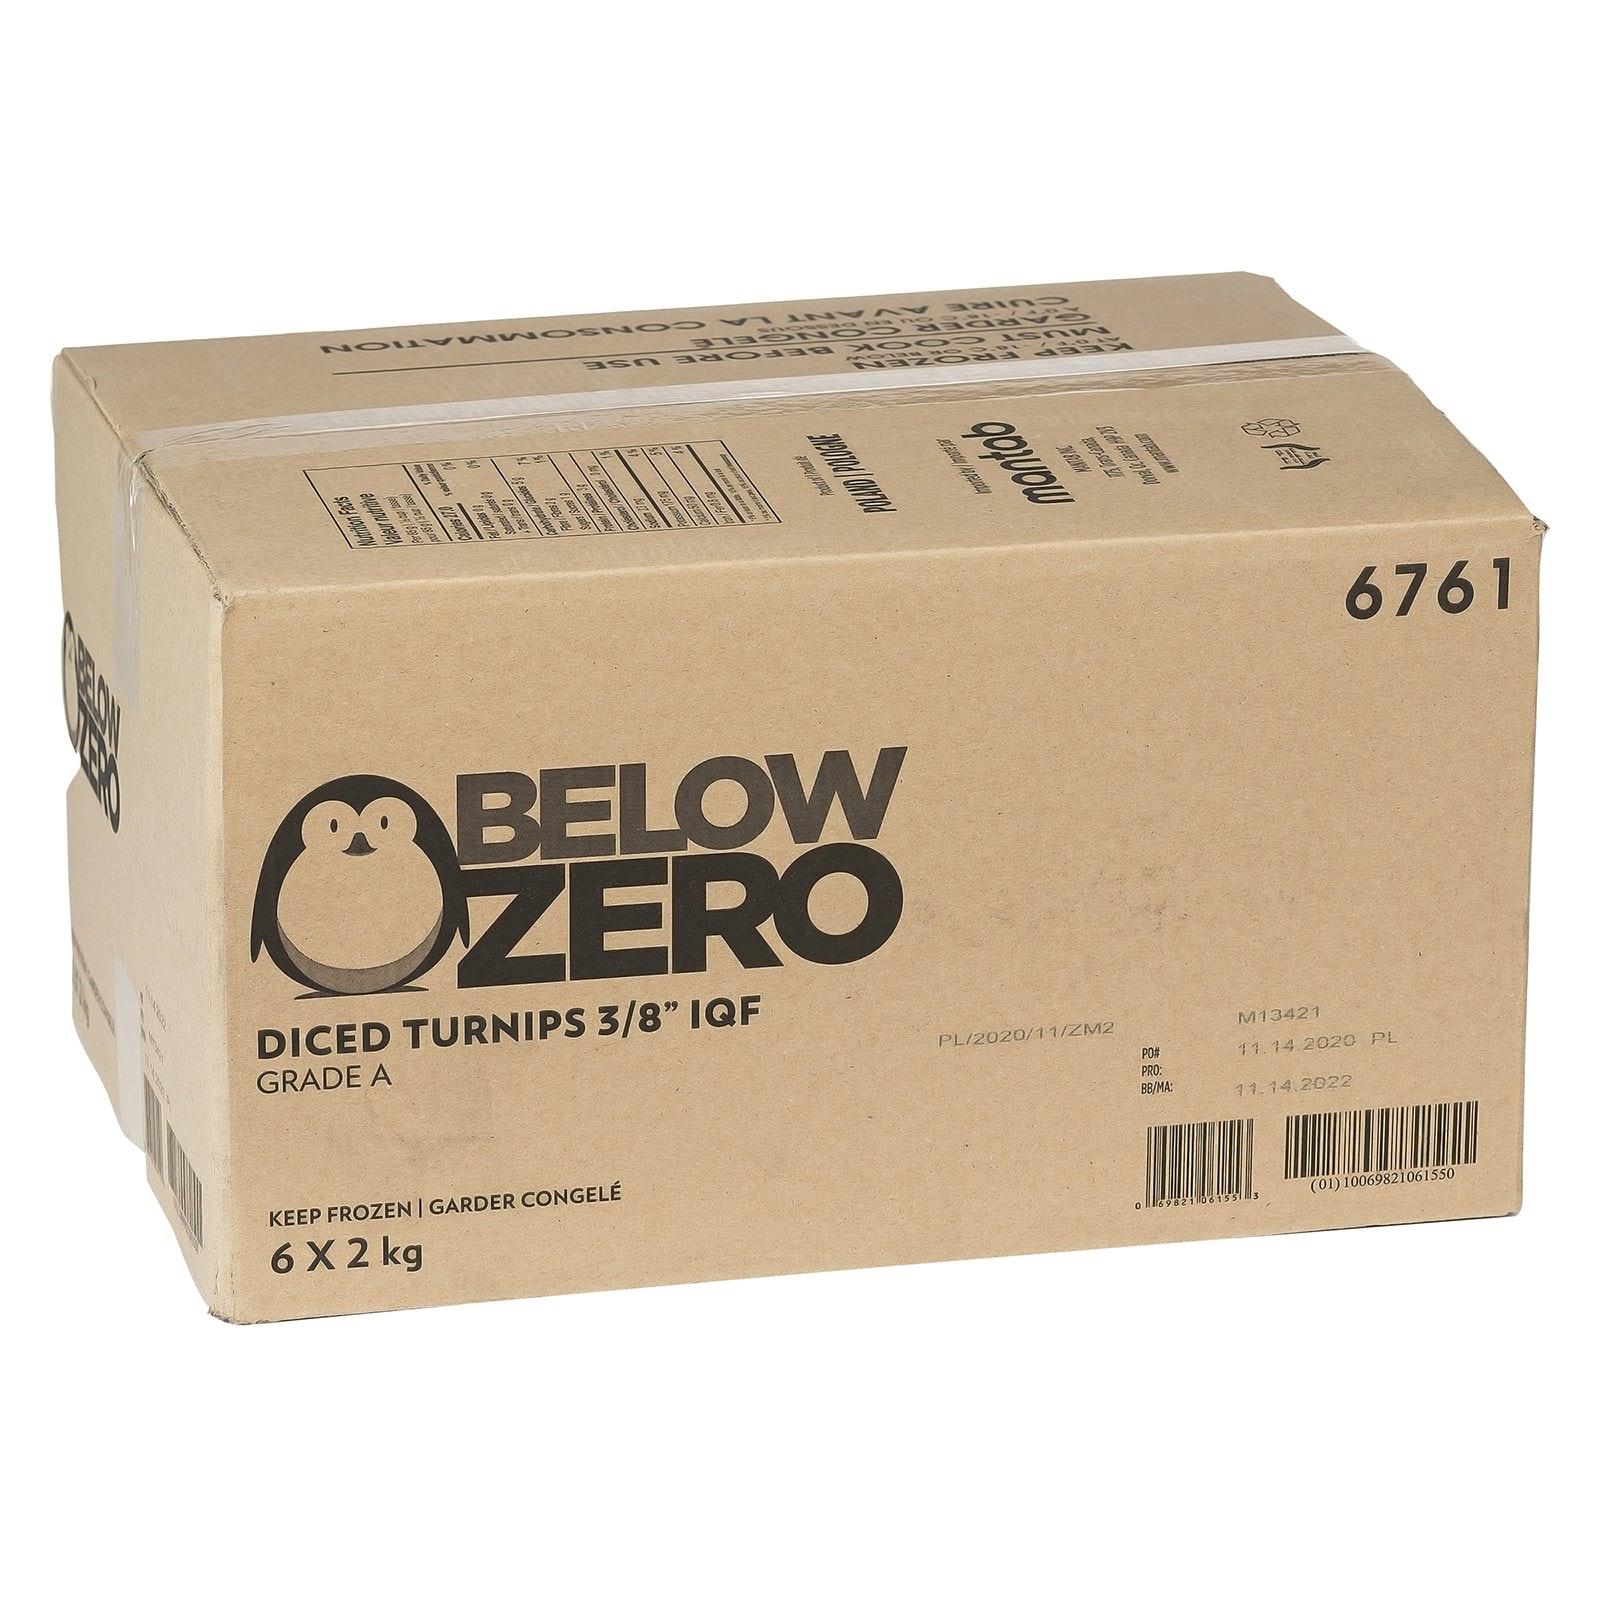 "BELOW ZERO Diced turnips 3/8"""